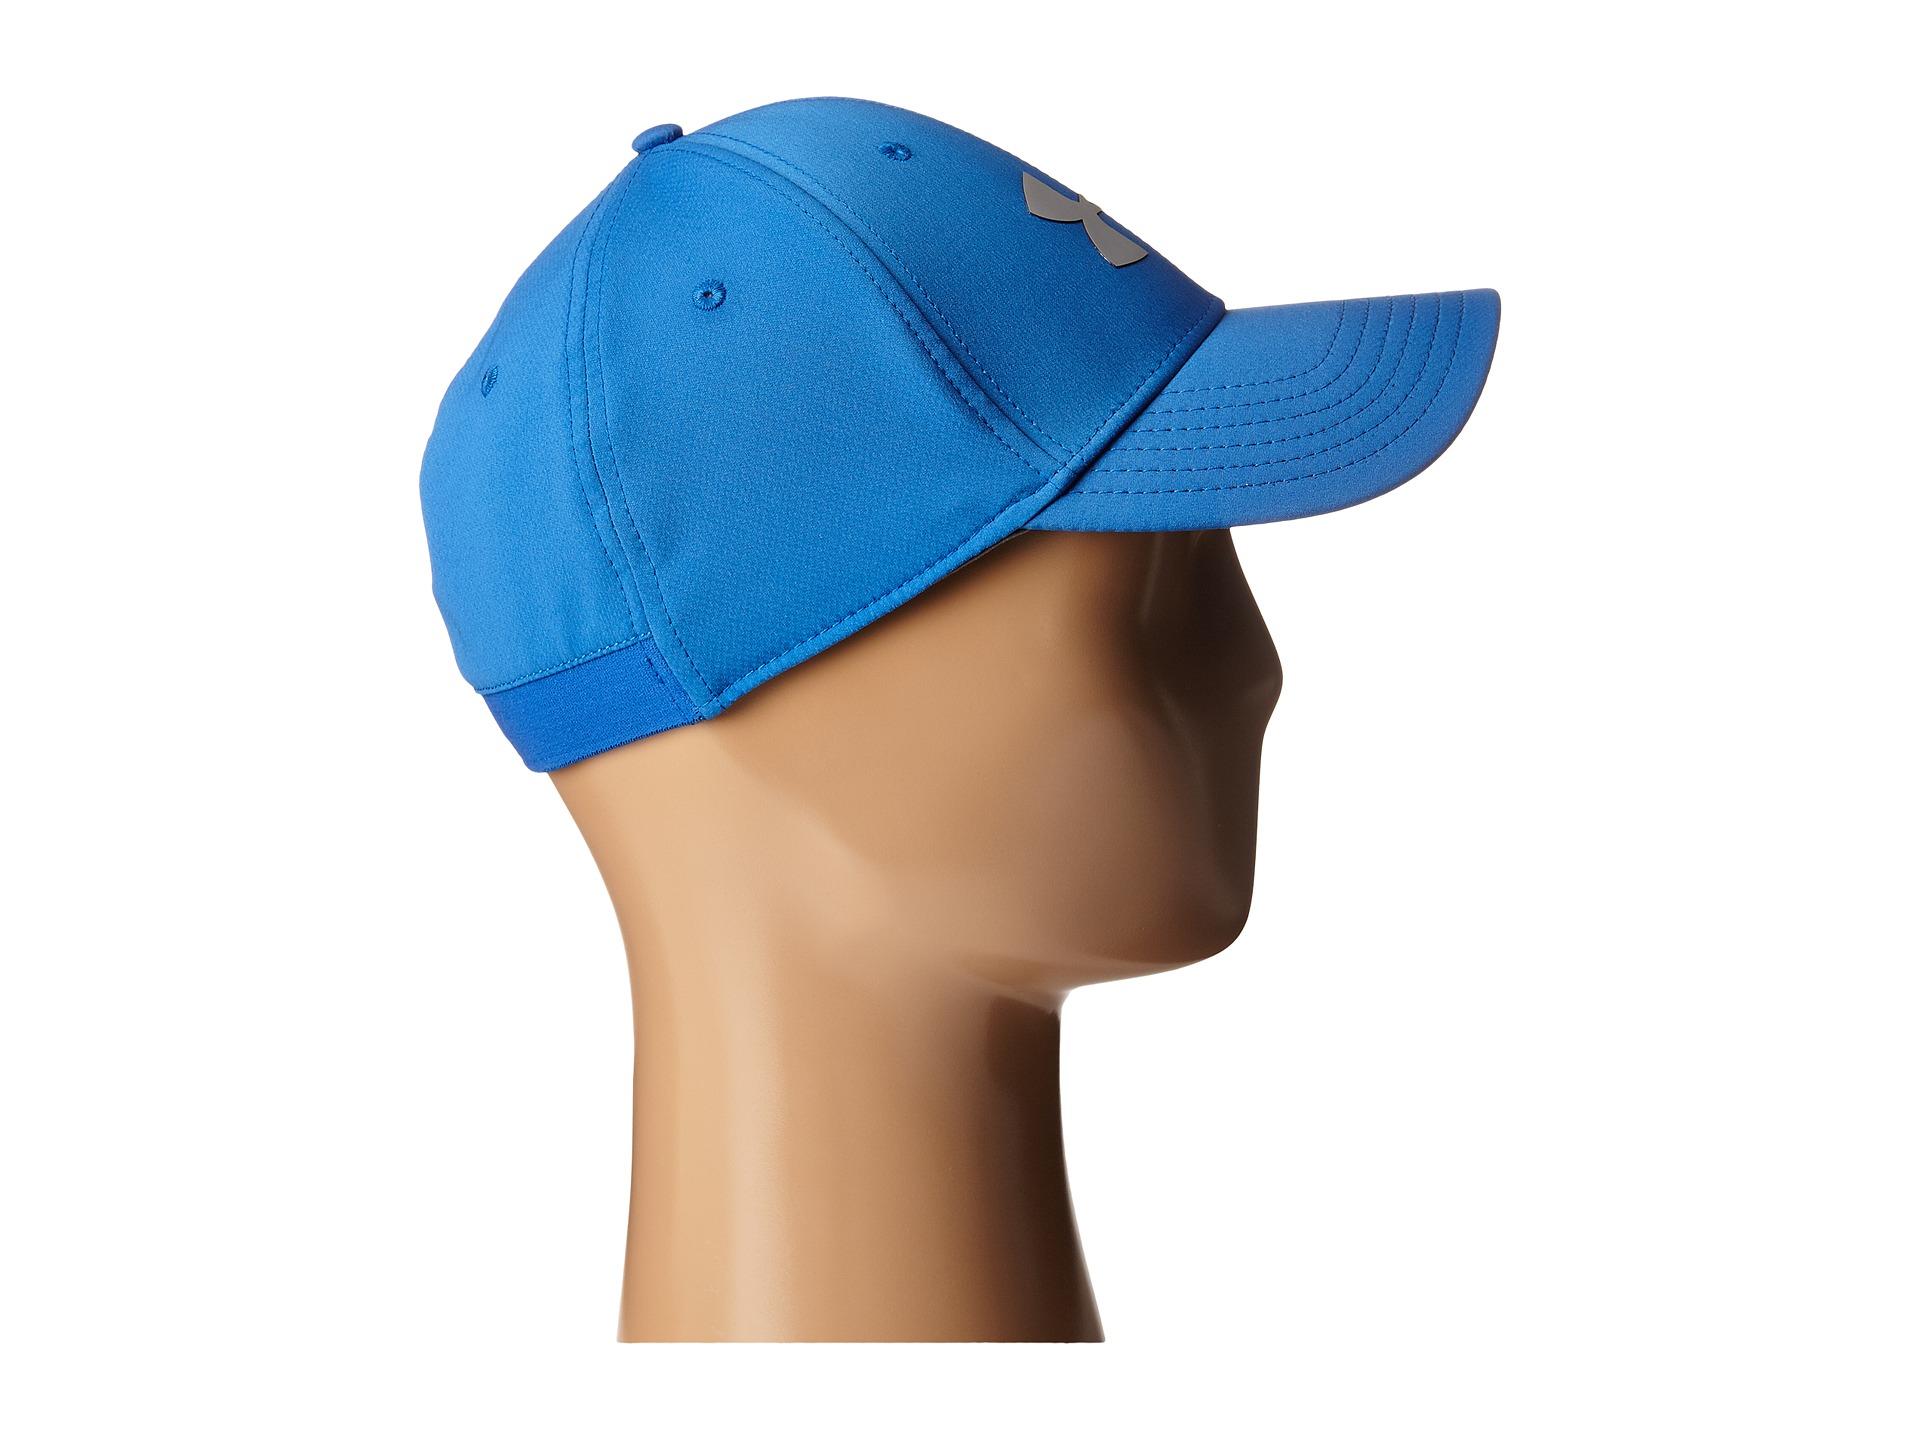 Lyst - Under Armour Ua Golf Headline Cap in Blue for Men cb734273ddca